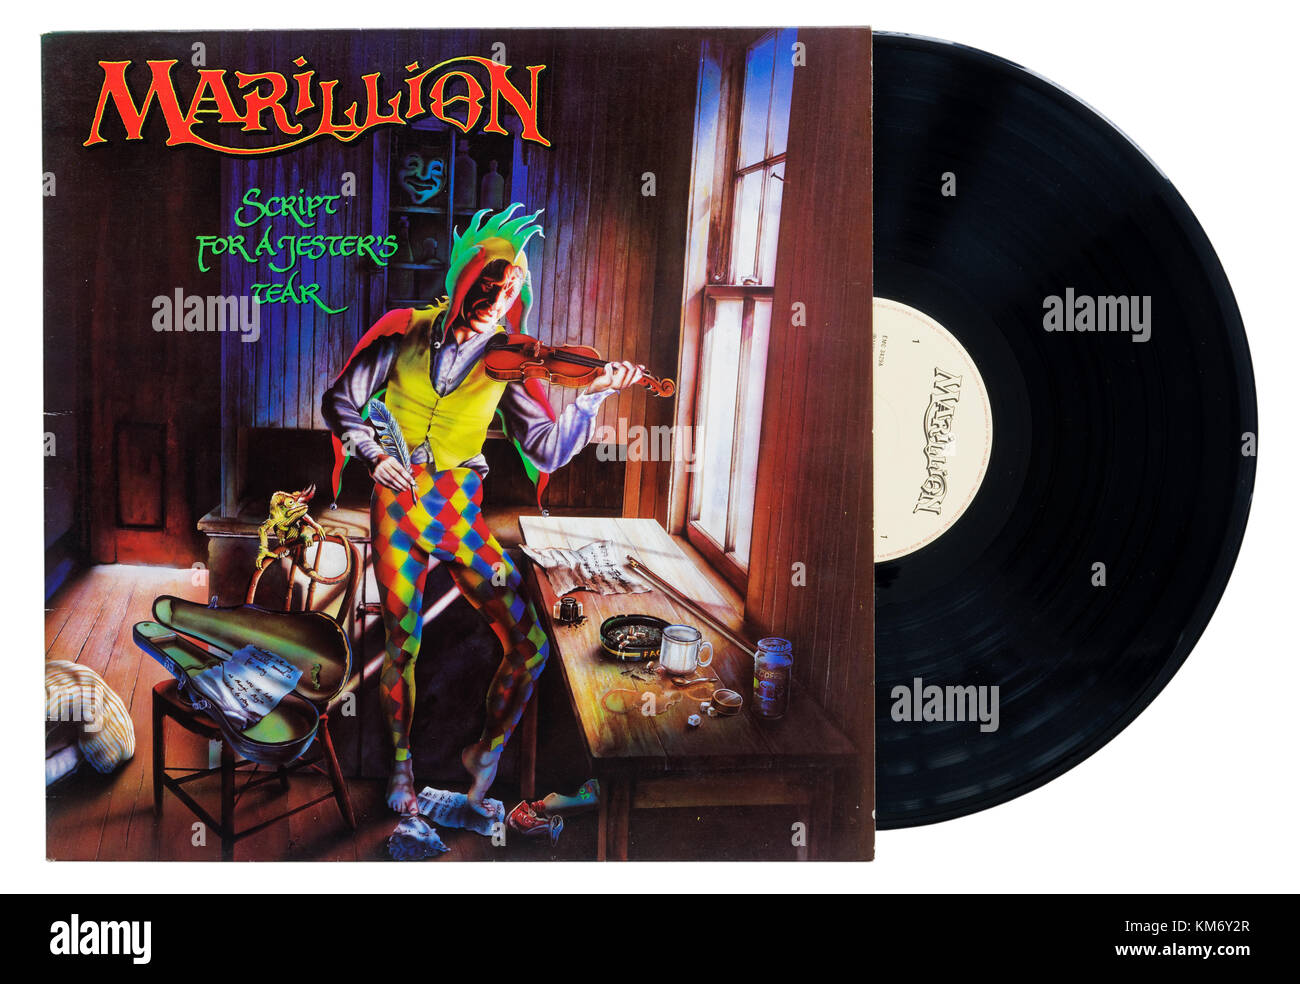 Marillion Script For a Jester's Tear album - Stock Image